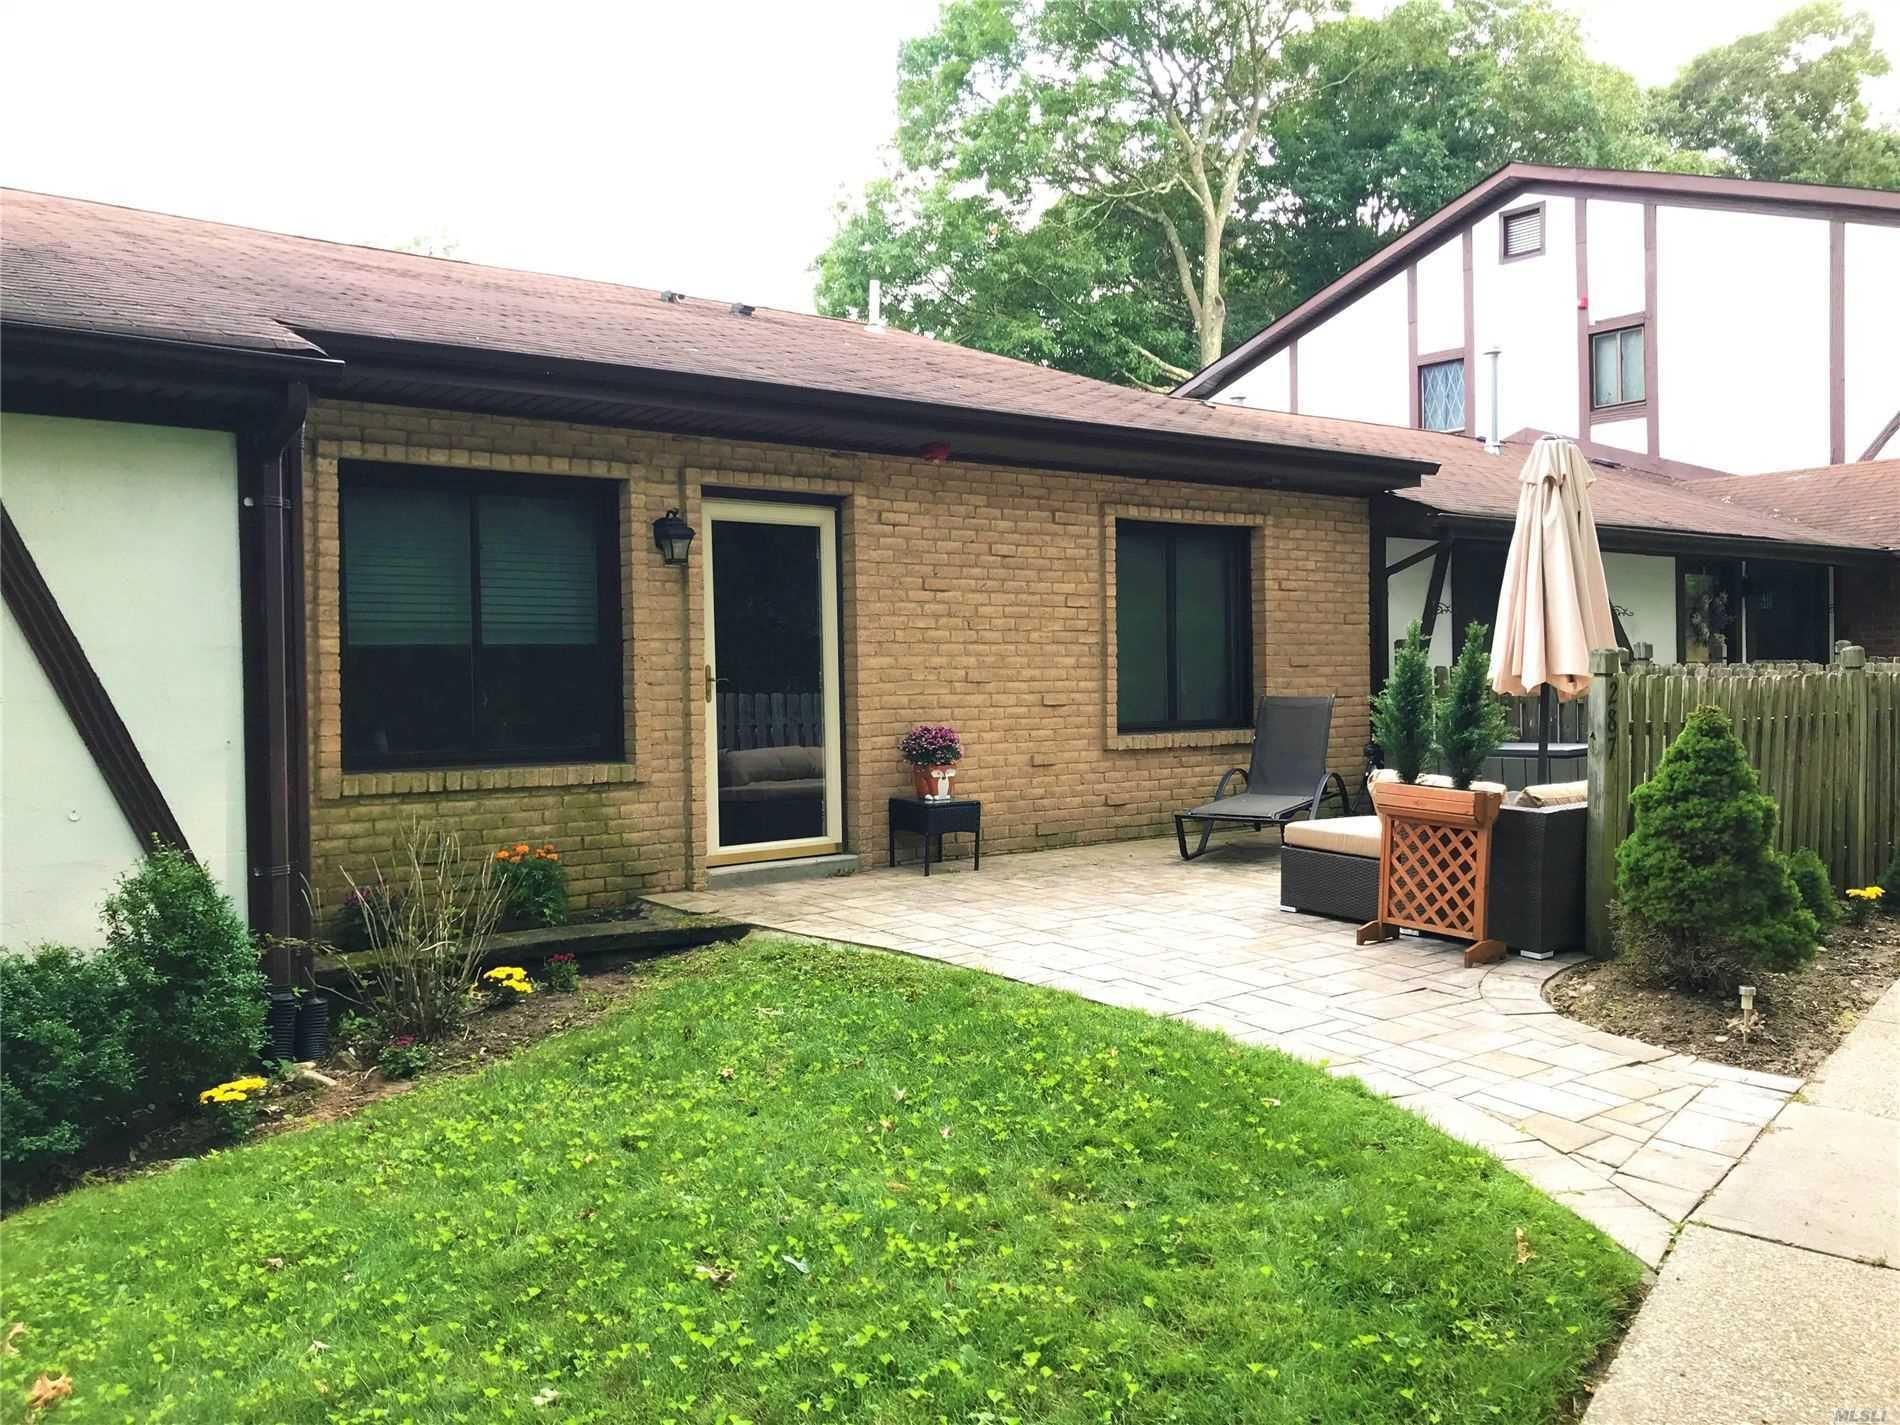 287 Brettonwoods Drive, Coram, NY 11727 - MLS#: 3247334